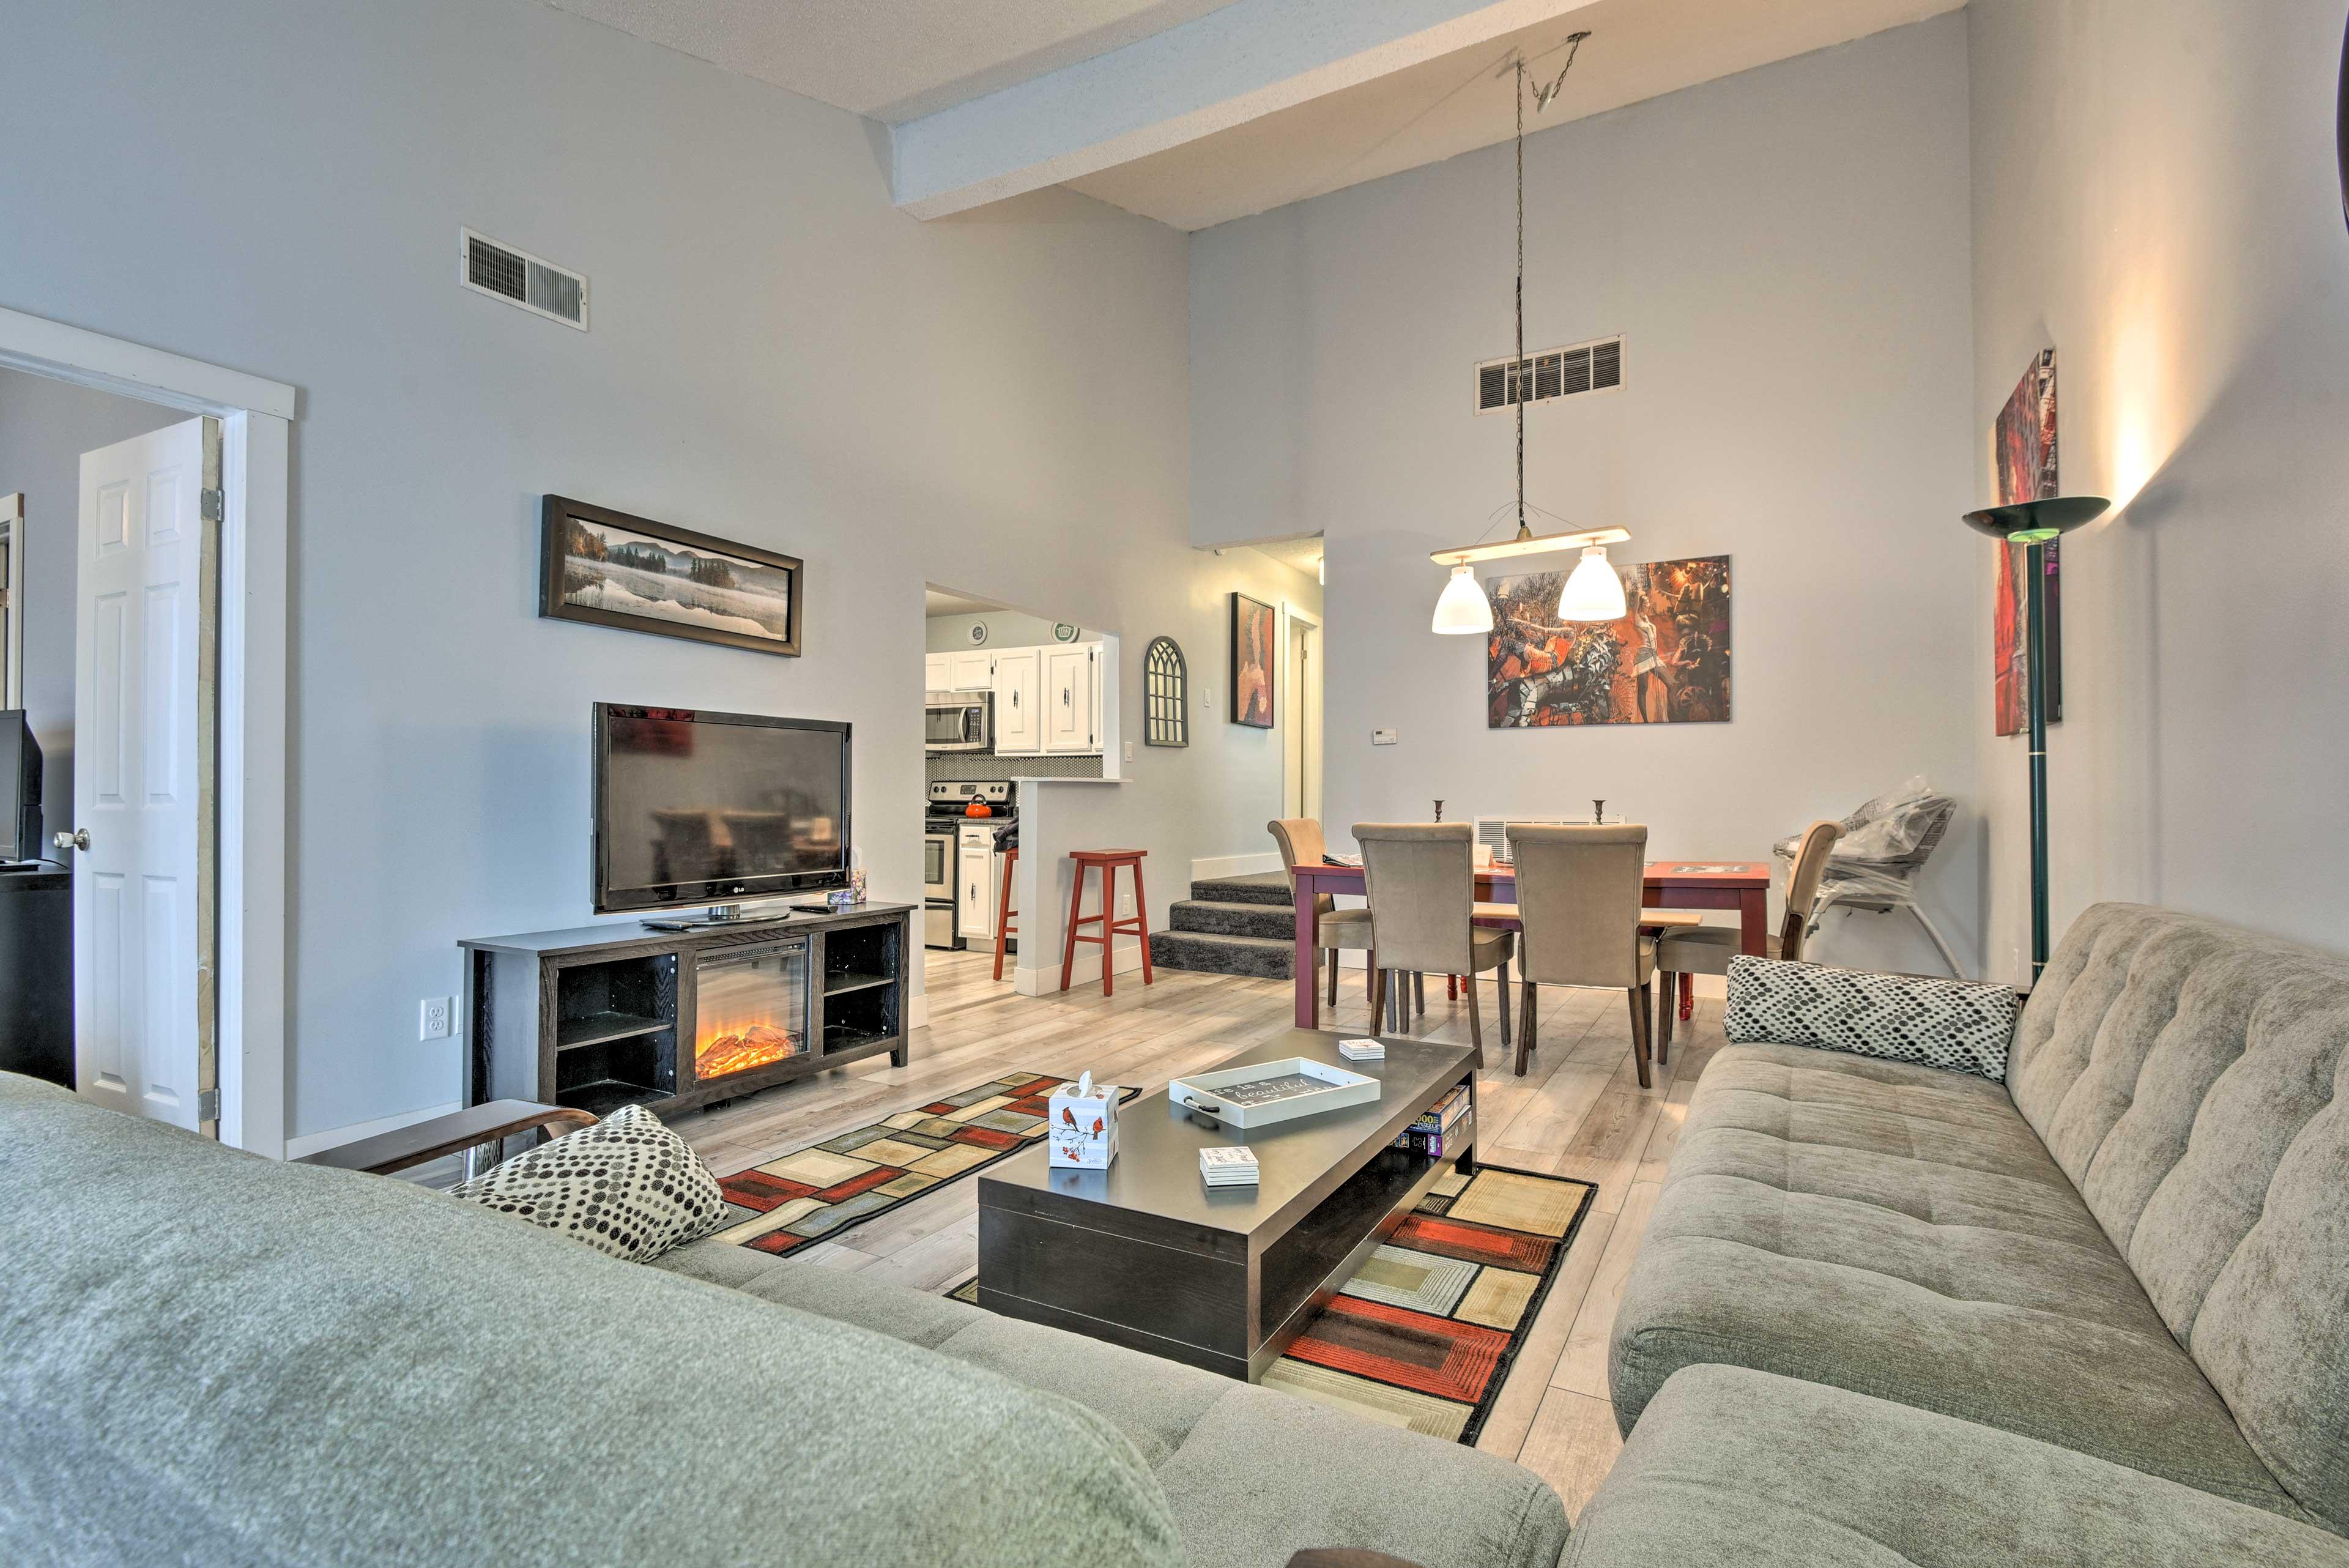 Unwind in this lavish  3-bedroom, 2-bathroom vacation rental apartment for 8.